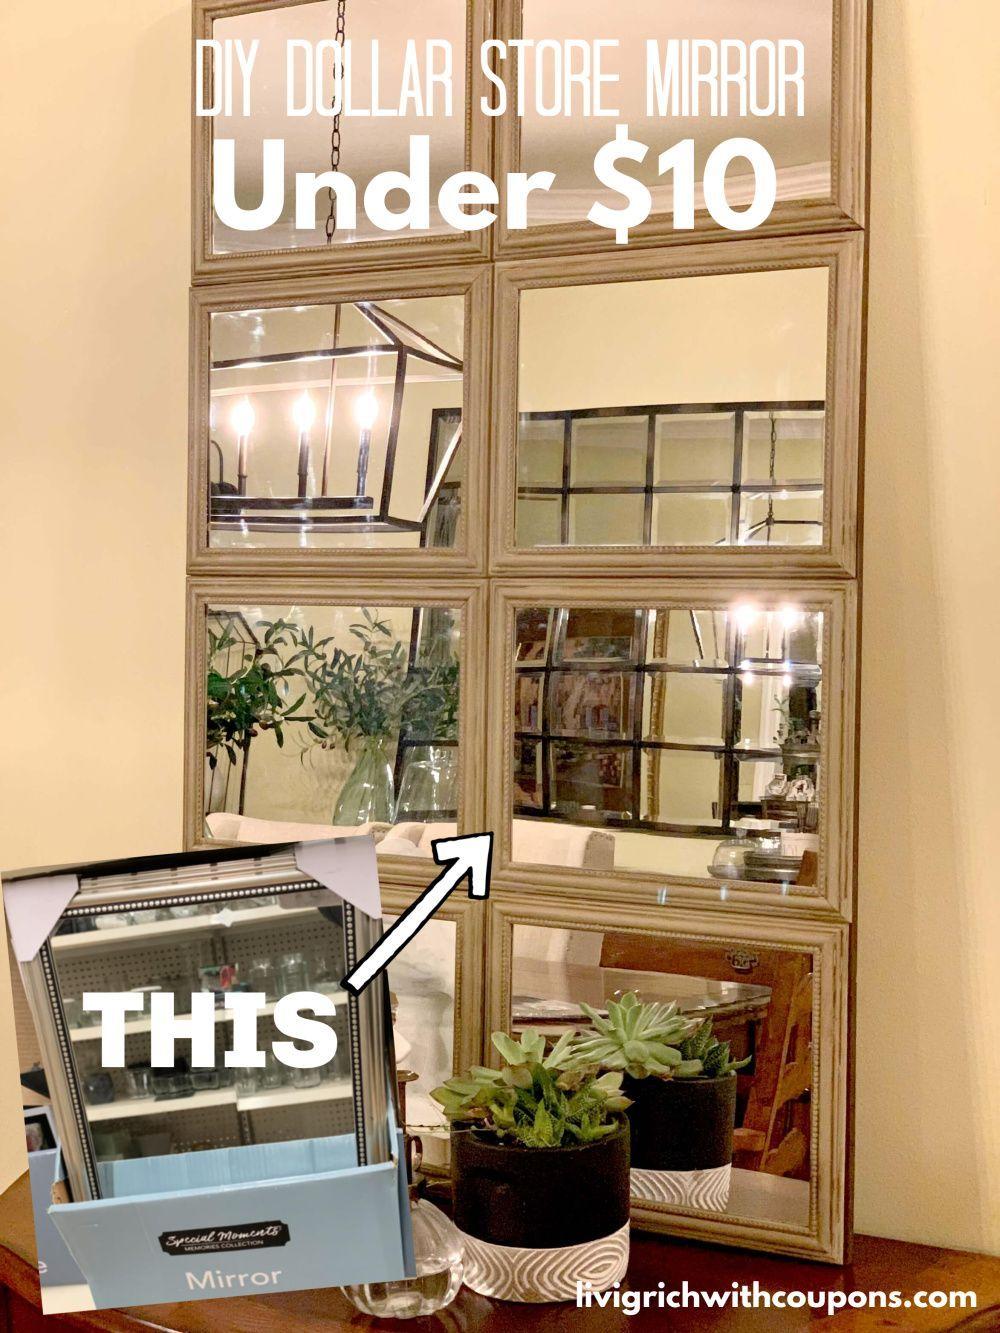 DIY Dollar Store Mirror - Under $10 - diy home decor - #Backyardpatiodesigns #Contemporary #decor #DIY #Diyfurniture #diyhomedecor #Diyhomedecordollarstore #Diytasselchandelier #Dollar #FarmhouseStyle #FrenchCountryStyle #Home #Homeorganization #mirror #Outdoorpatioideas #Rustichomedecor #ScandinavianStyle #Store